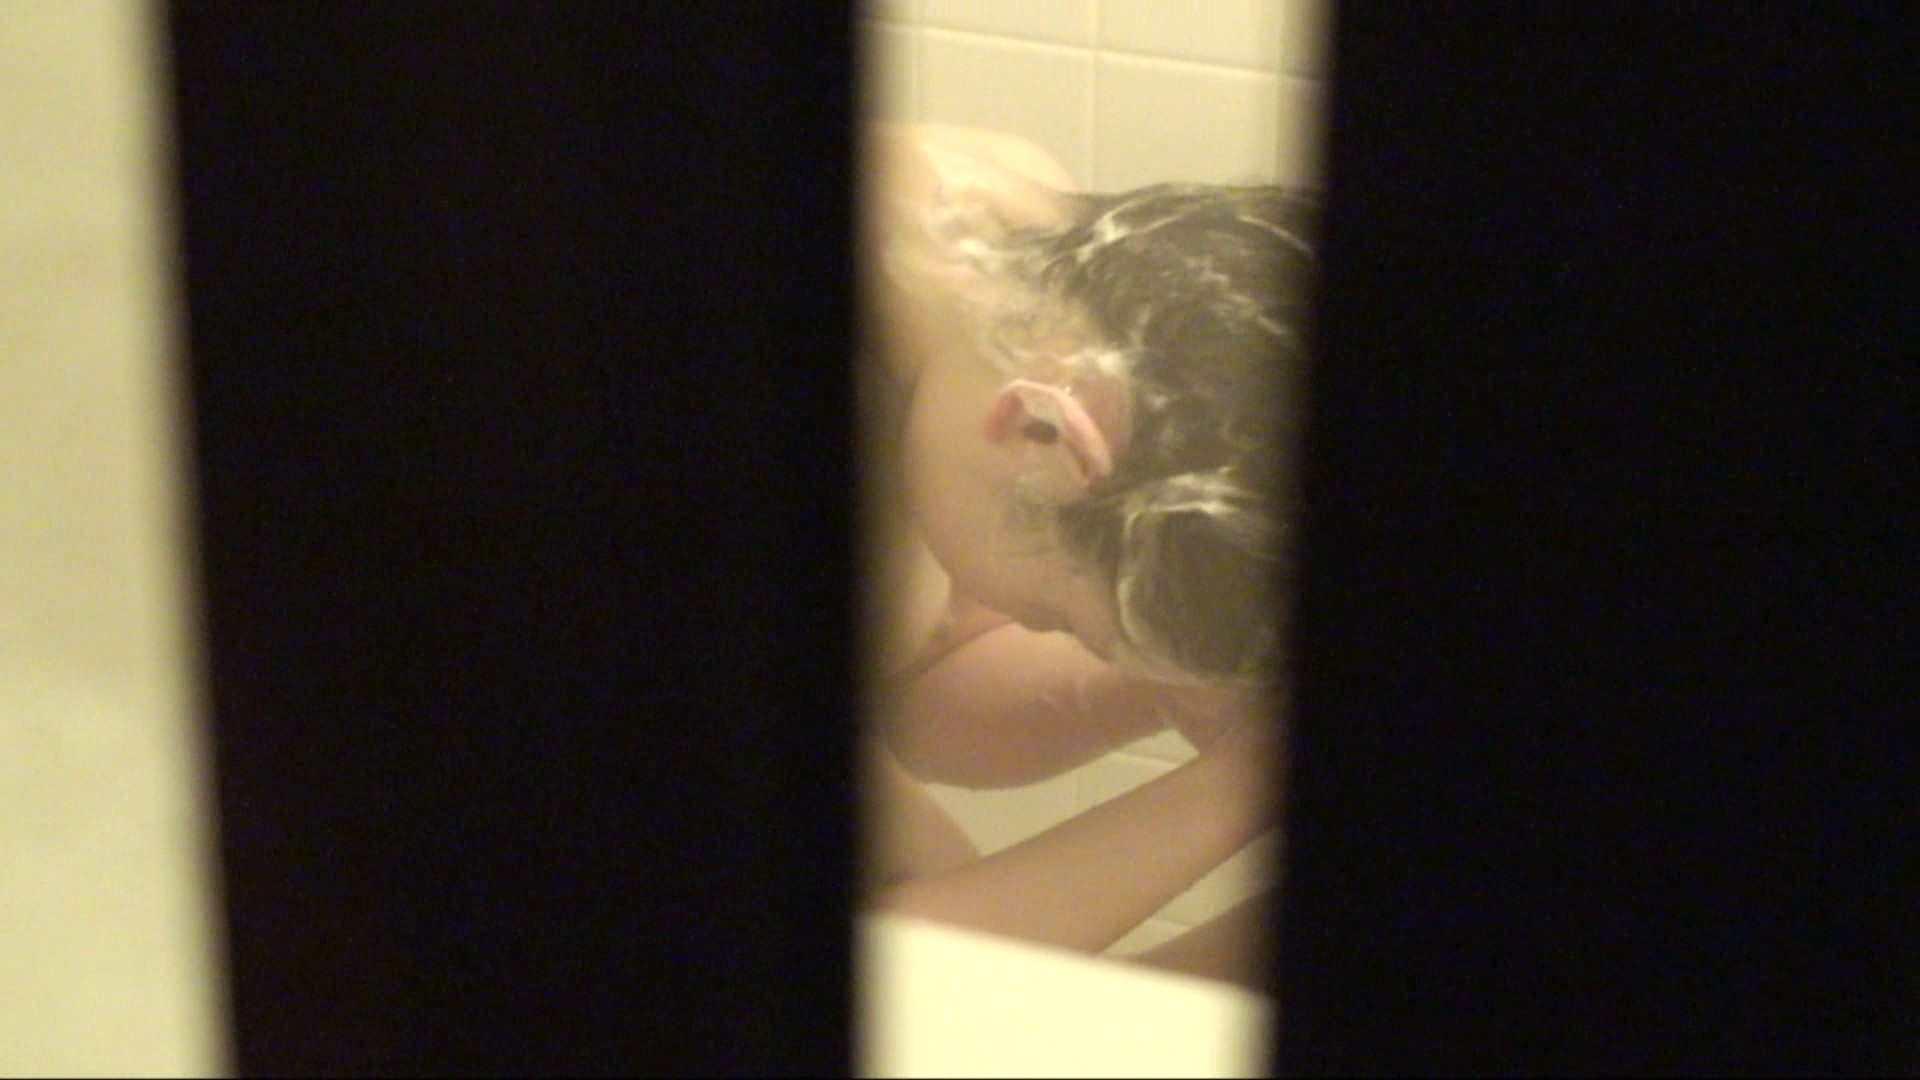 vol.02超可愛すぎる彼女の裸体をハイビジョンで!至近距離での眺め最高! 美人 | 民家  103pic 1